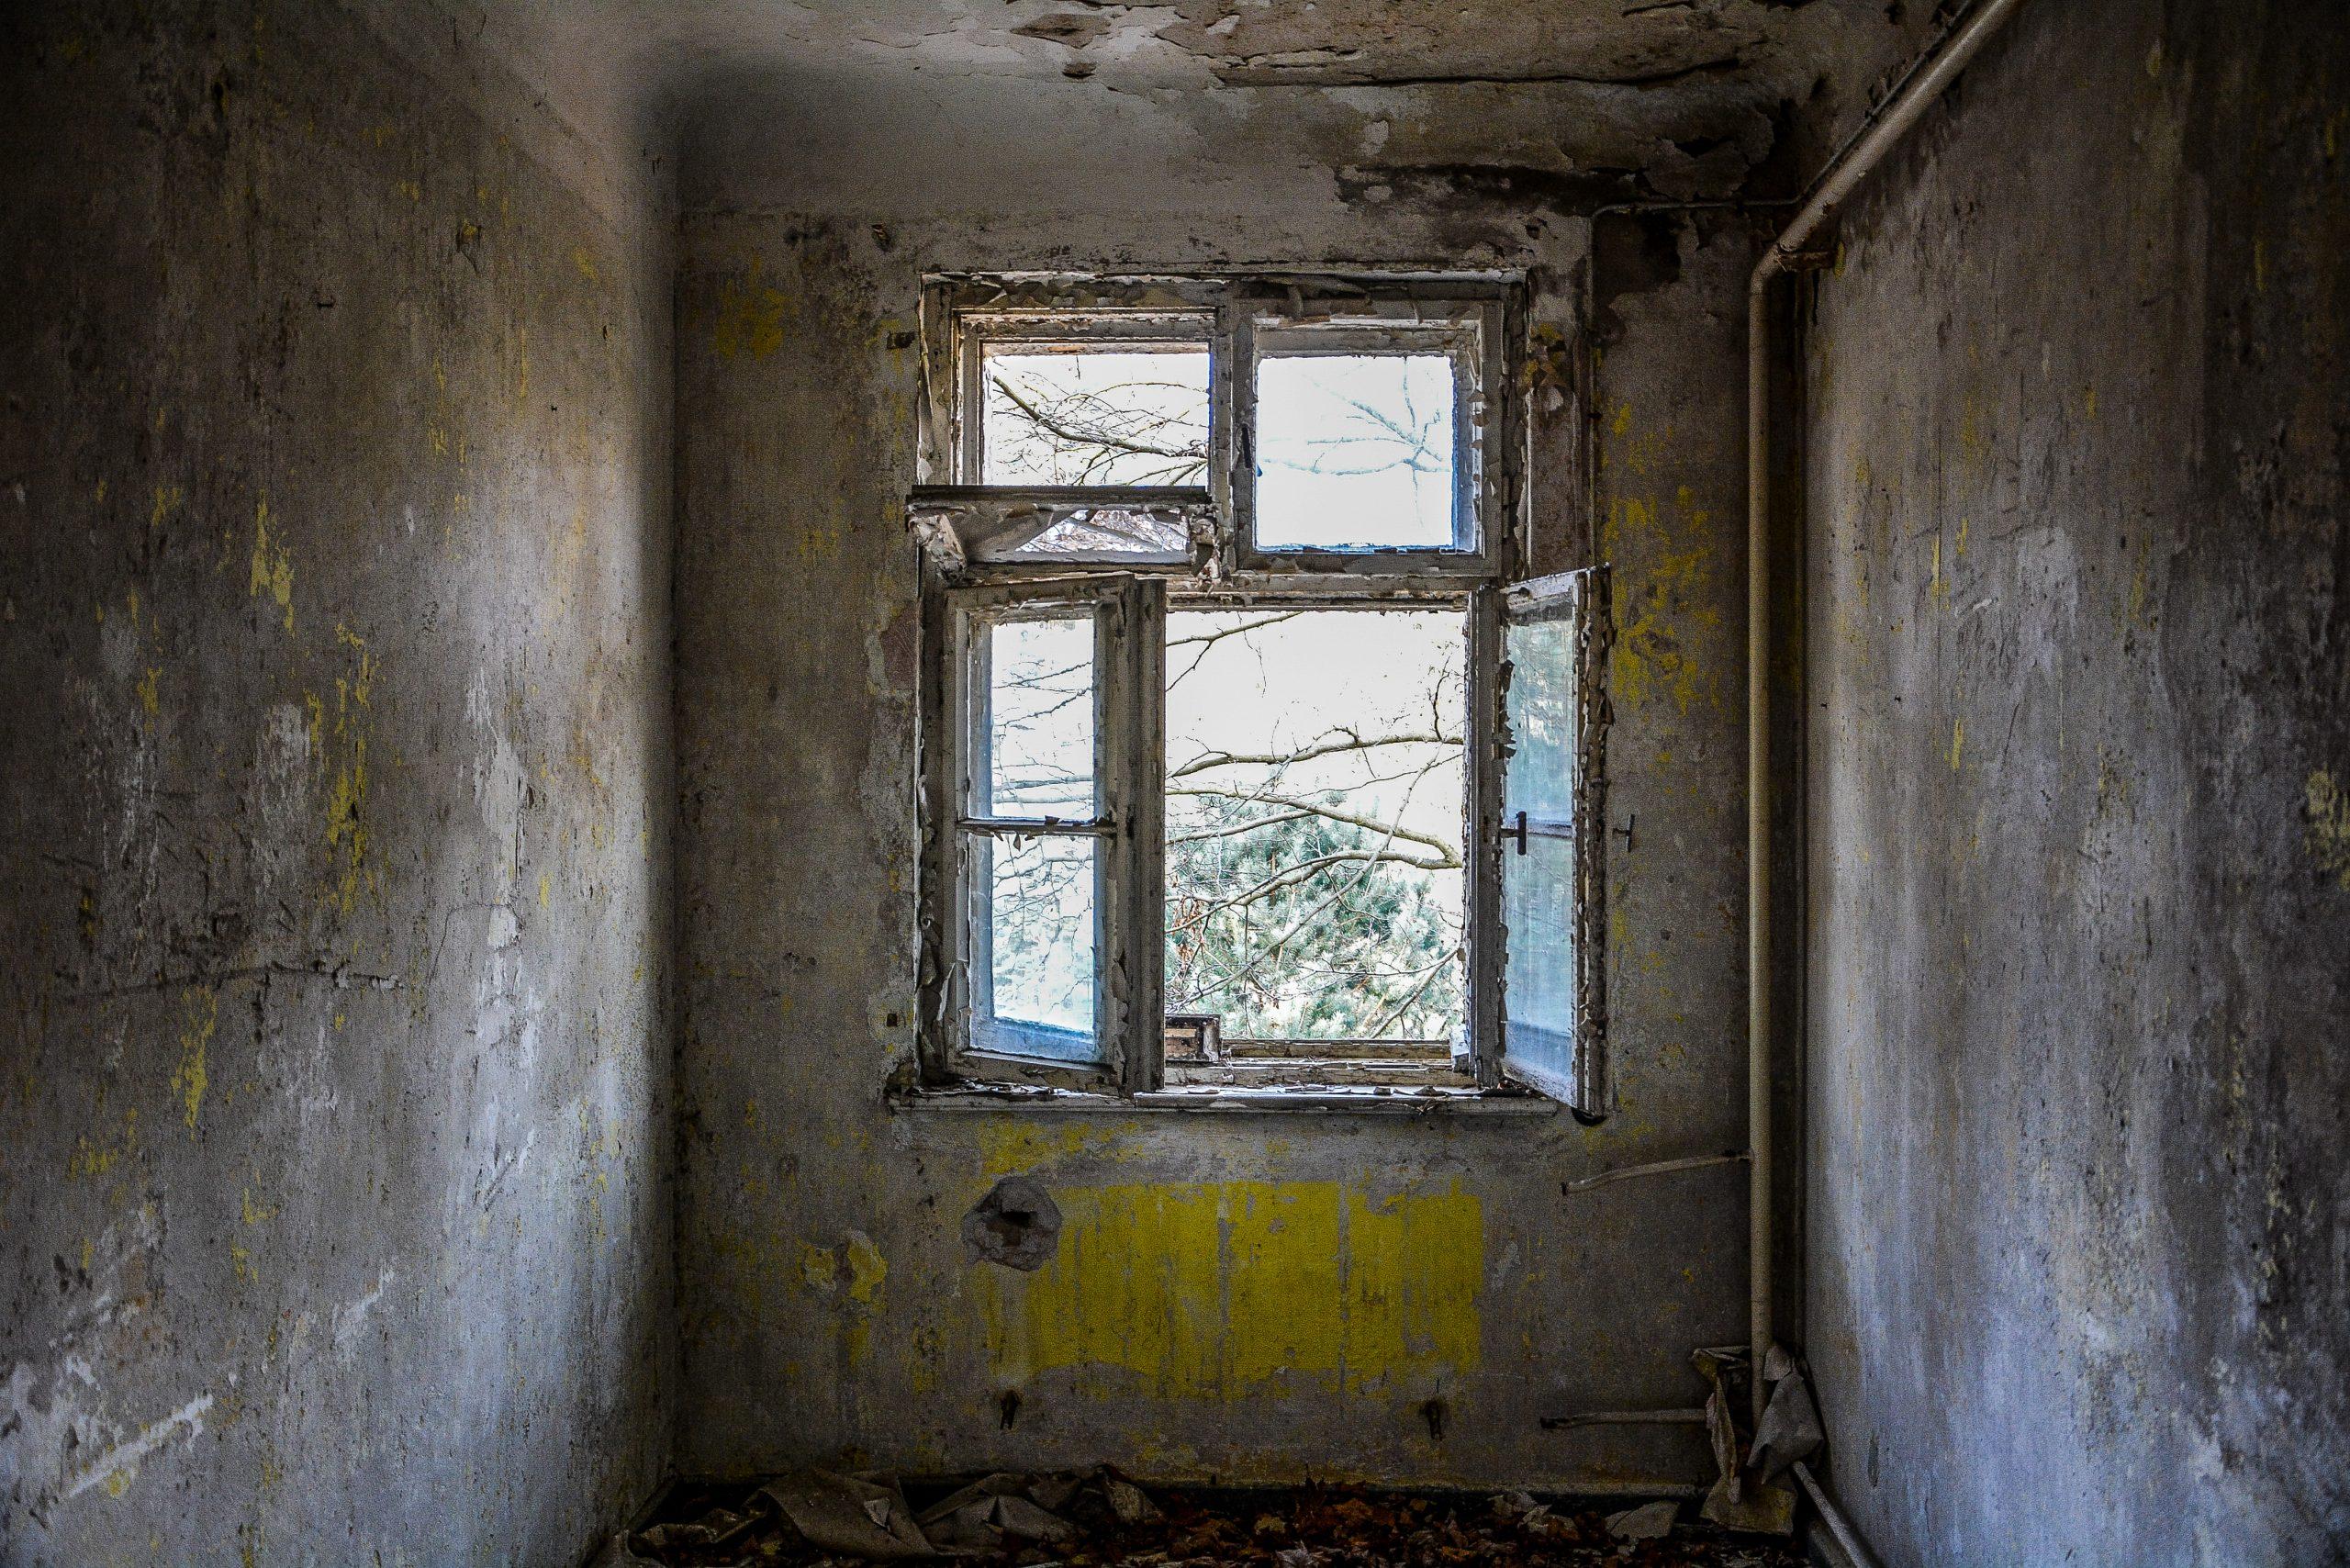 yellow grey hallway window forst zinna adolf hitler lager luckenwalde juterbog sowjet kaserne soviet military barracks germany lost places urbex abandoned